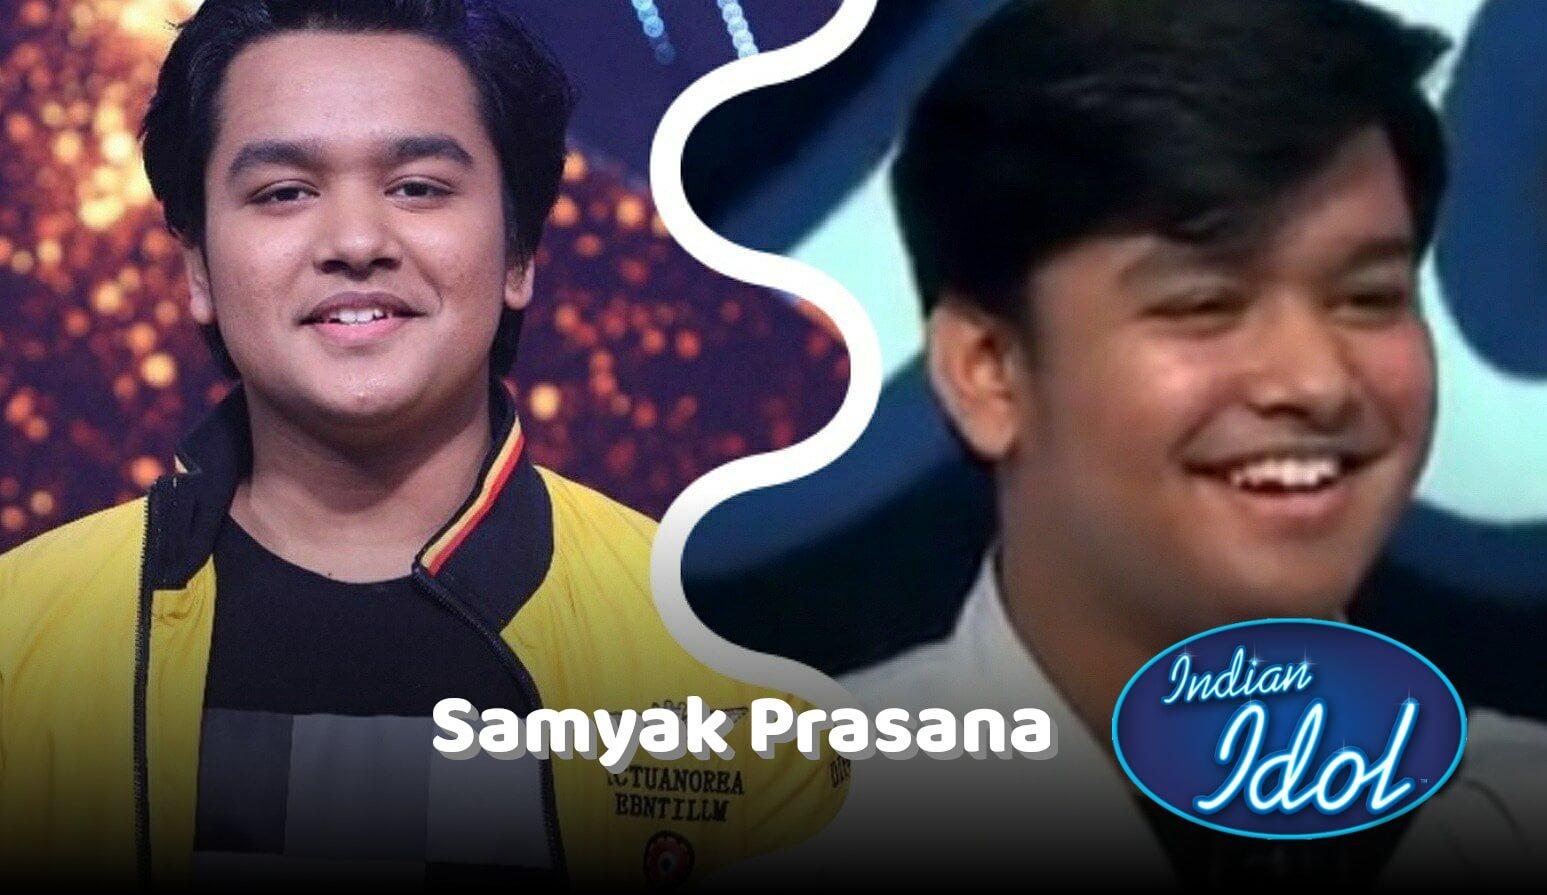 Samyak-Prasana-Indian-Idol-2020-Contestant-Wiki-Age-Bio-Hometown-Season-12